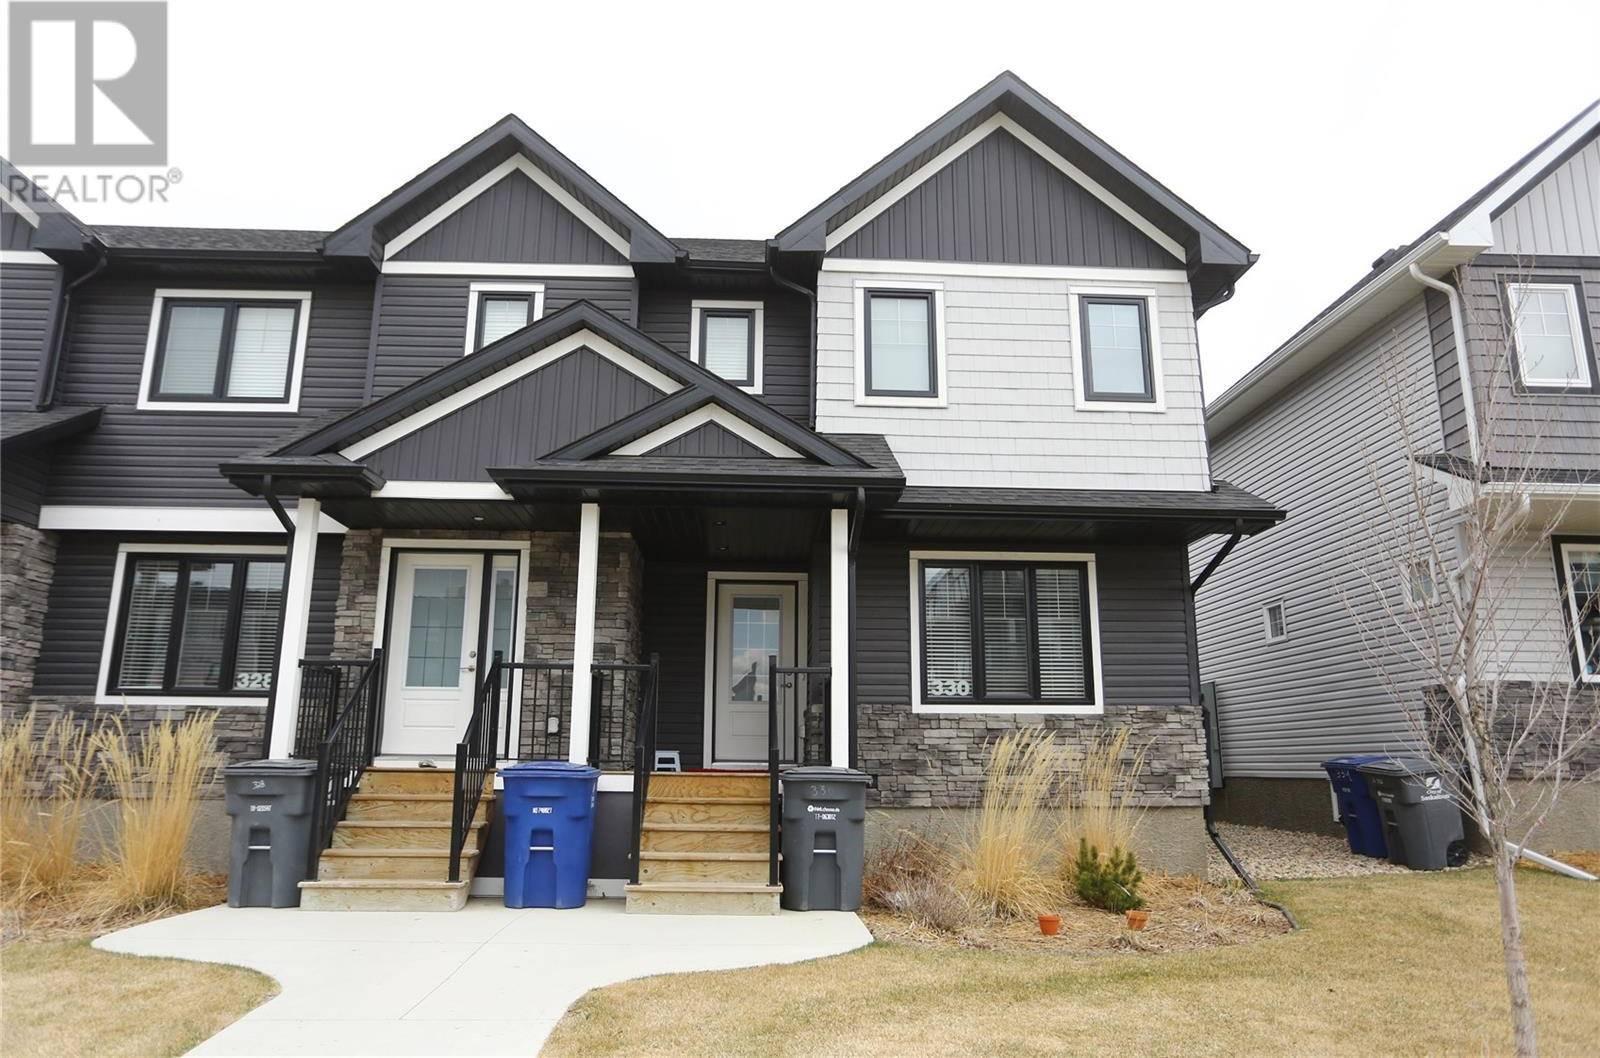 Townhouse for sale at 330 Maningas Bnd  Saskatoon Saskatchewan - MLS: SK770642